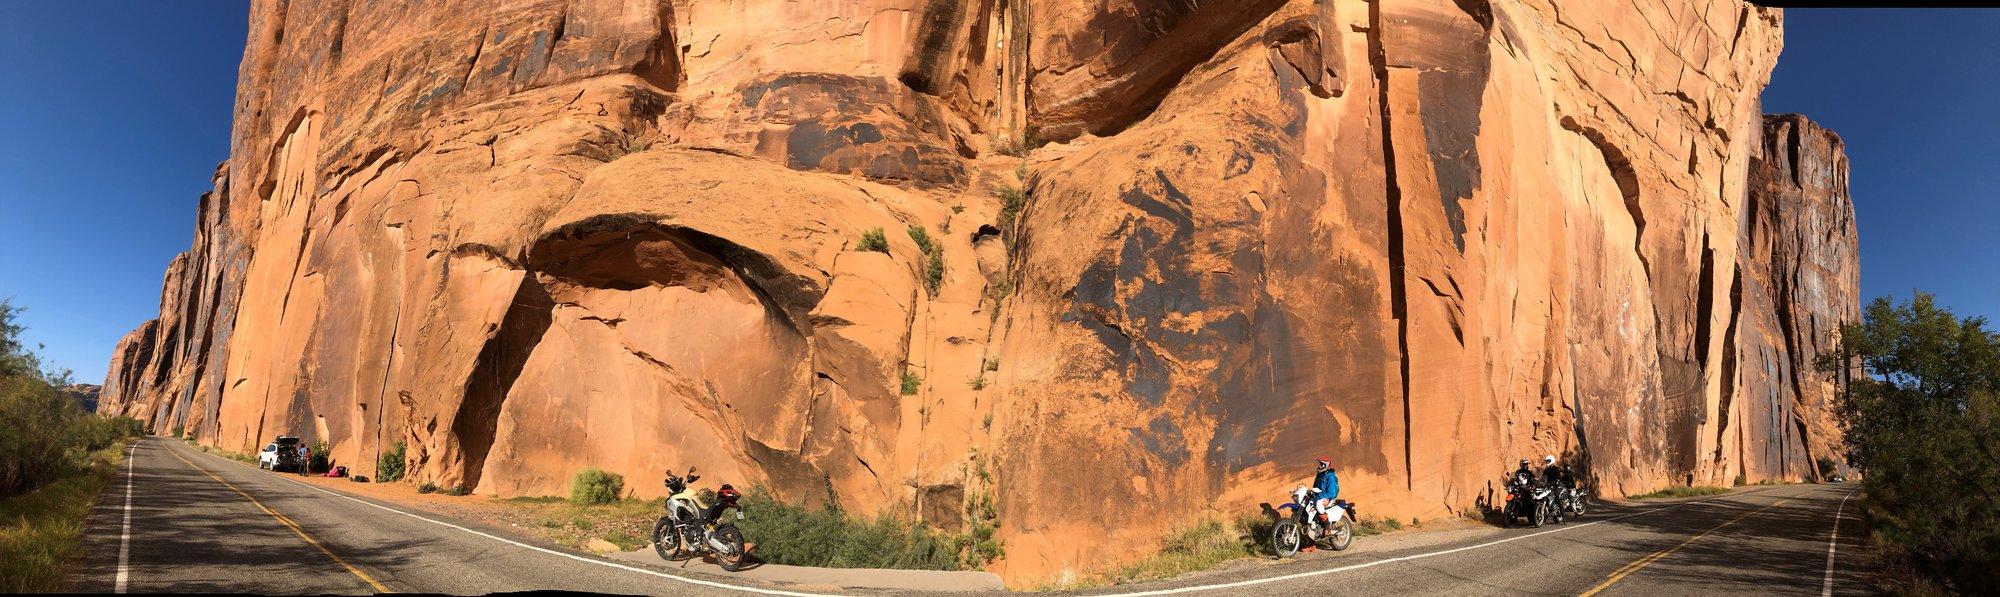 Moab climbers.jpg